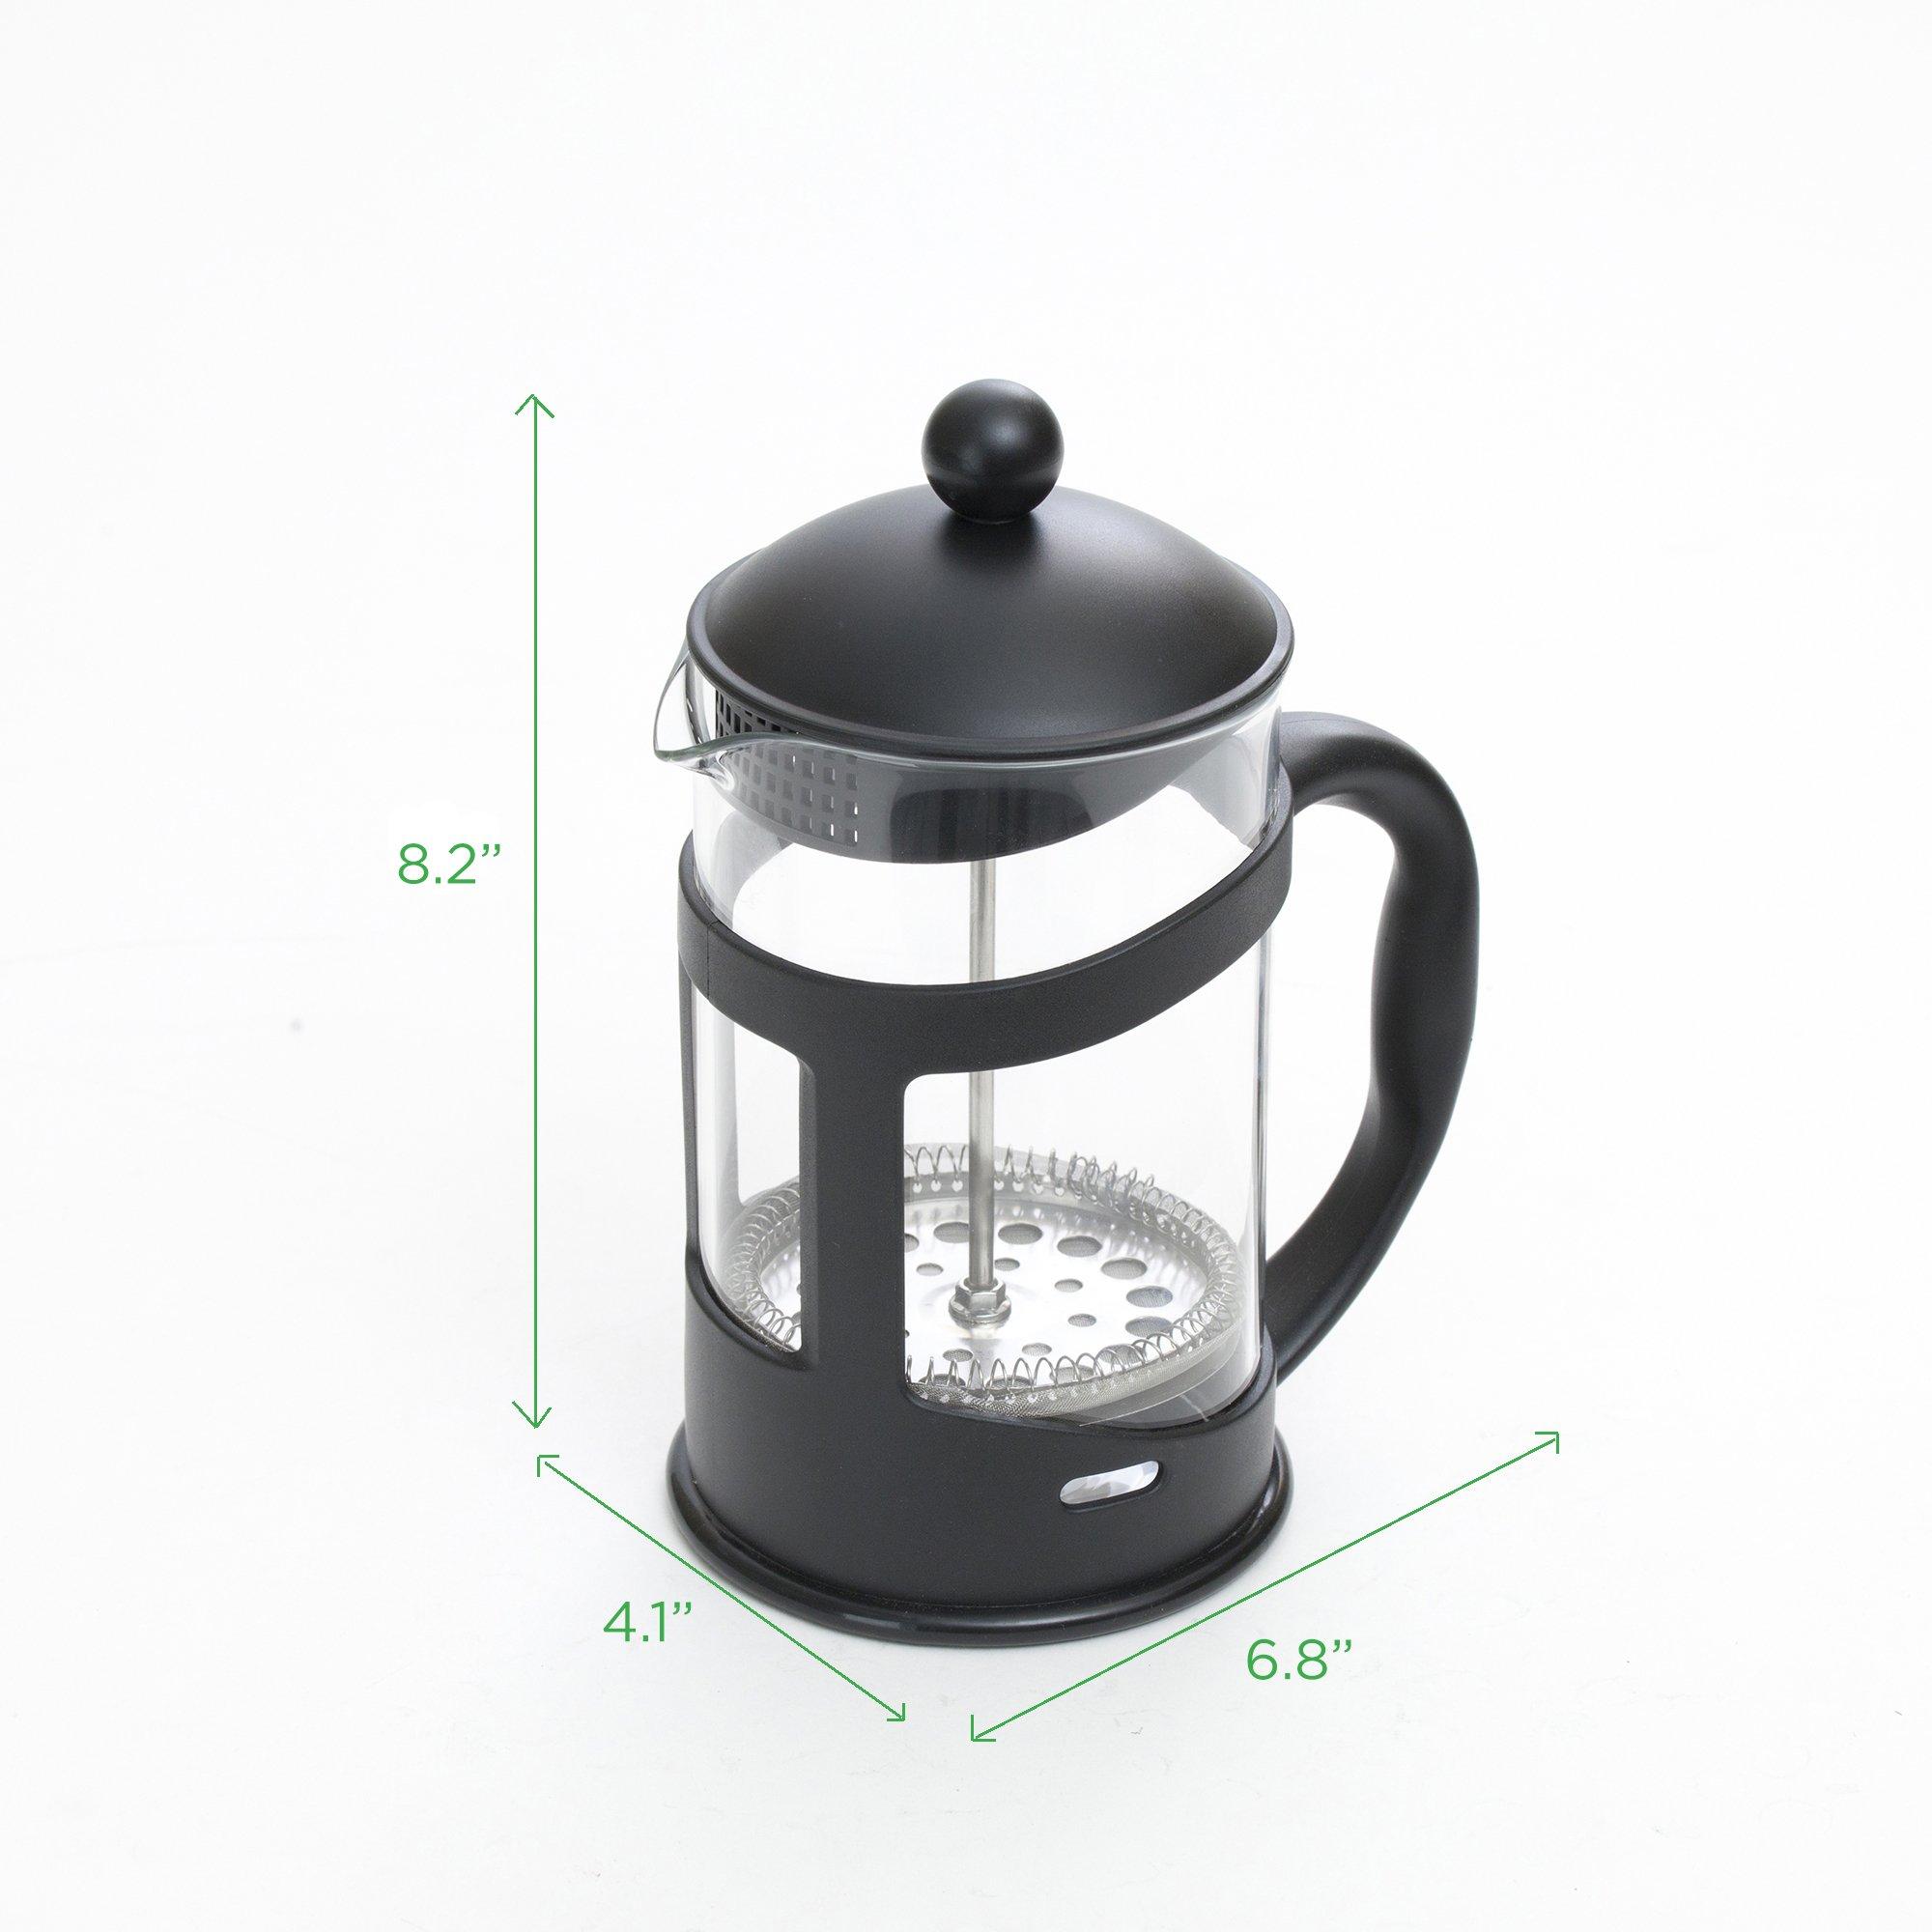 Mind Reader French Press Coffee & Tea Maker 27 oz, Glass by Mind Reader (Image #6)